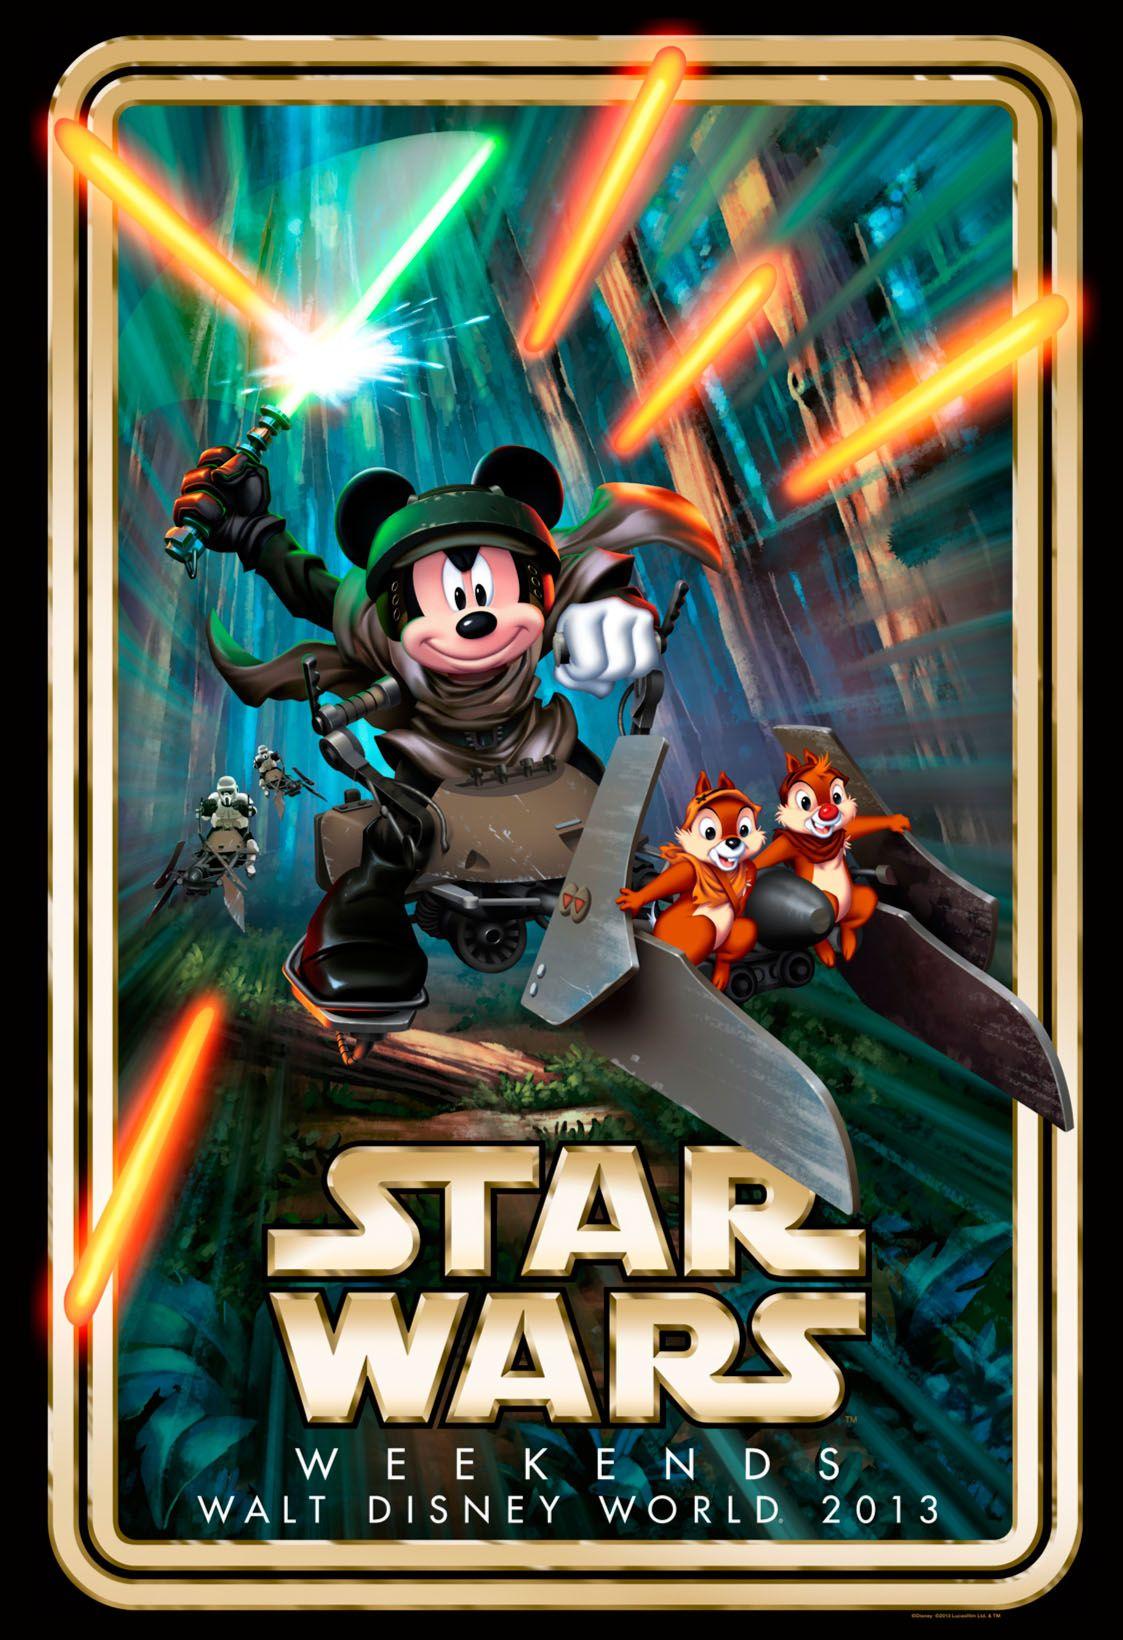 WDW Star Wars Weekend poster